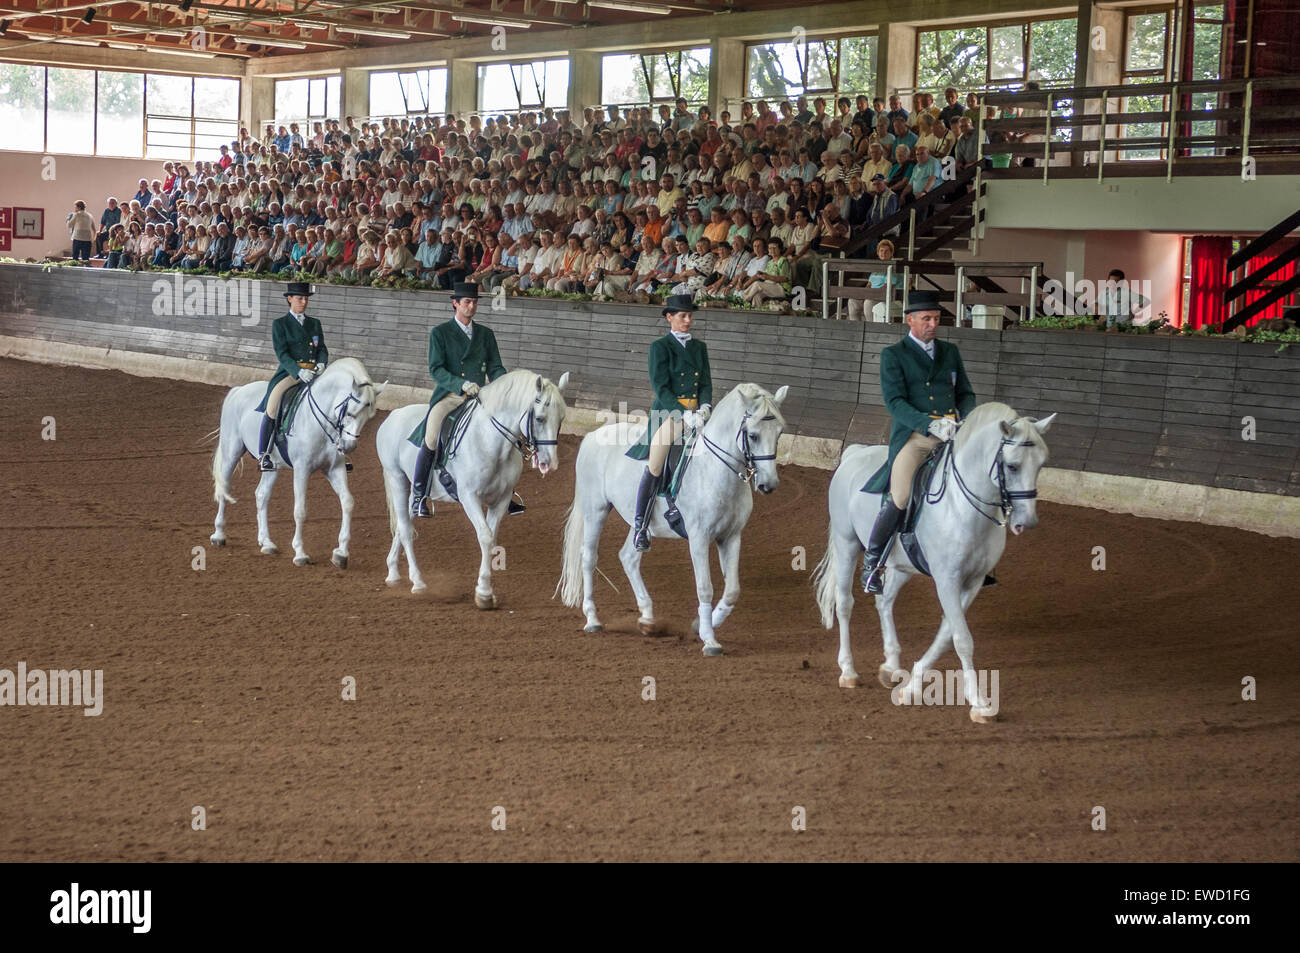 Lipizzaner performing horses at Lipica Stud Farm. Slovenia - Stock Image